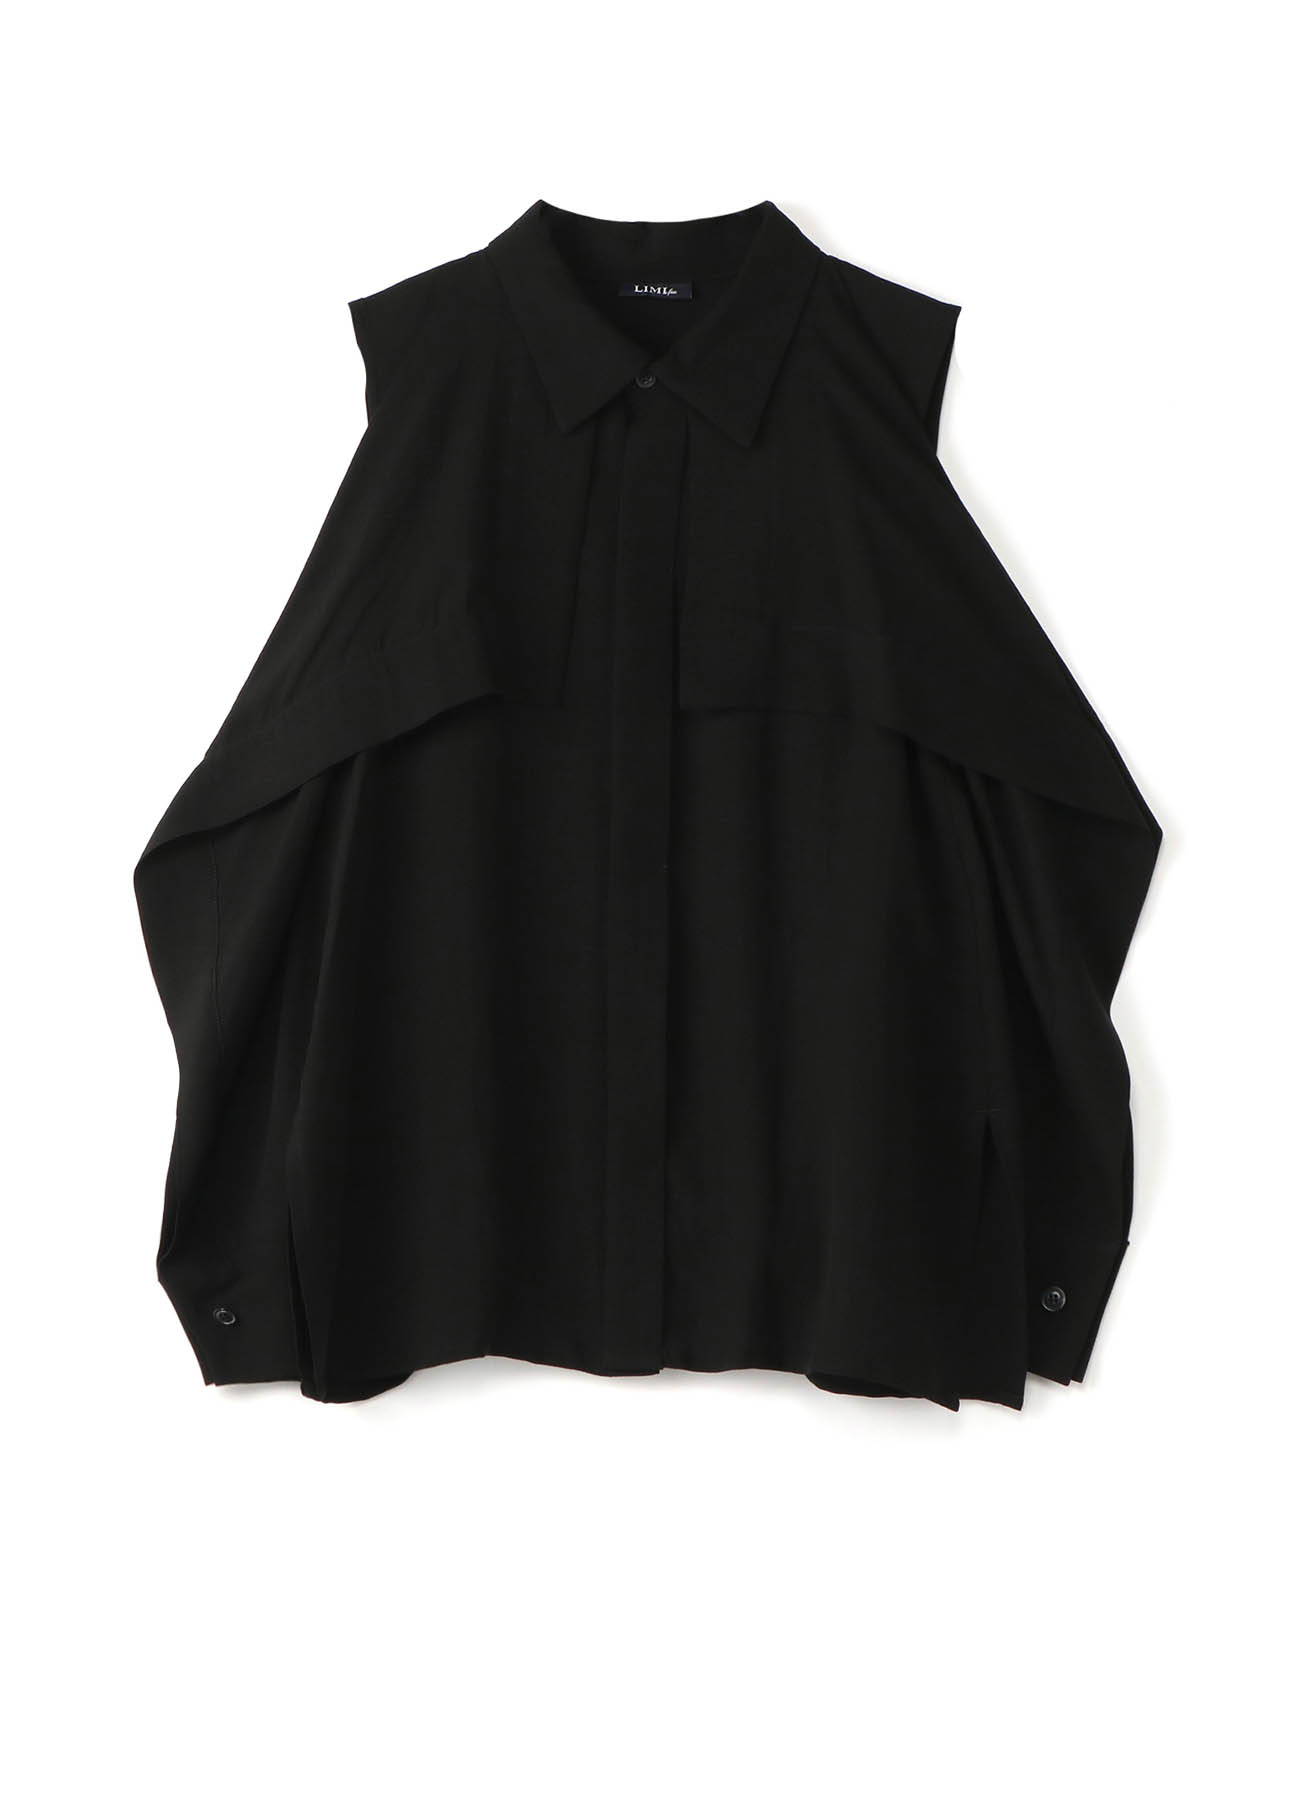 Ten/Cu Tussah Square Sleeve Shirt